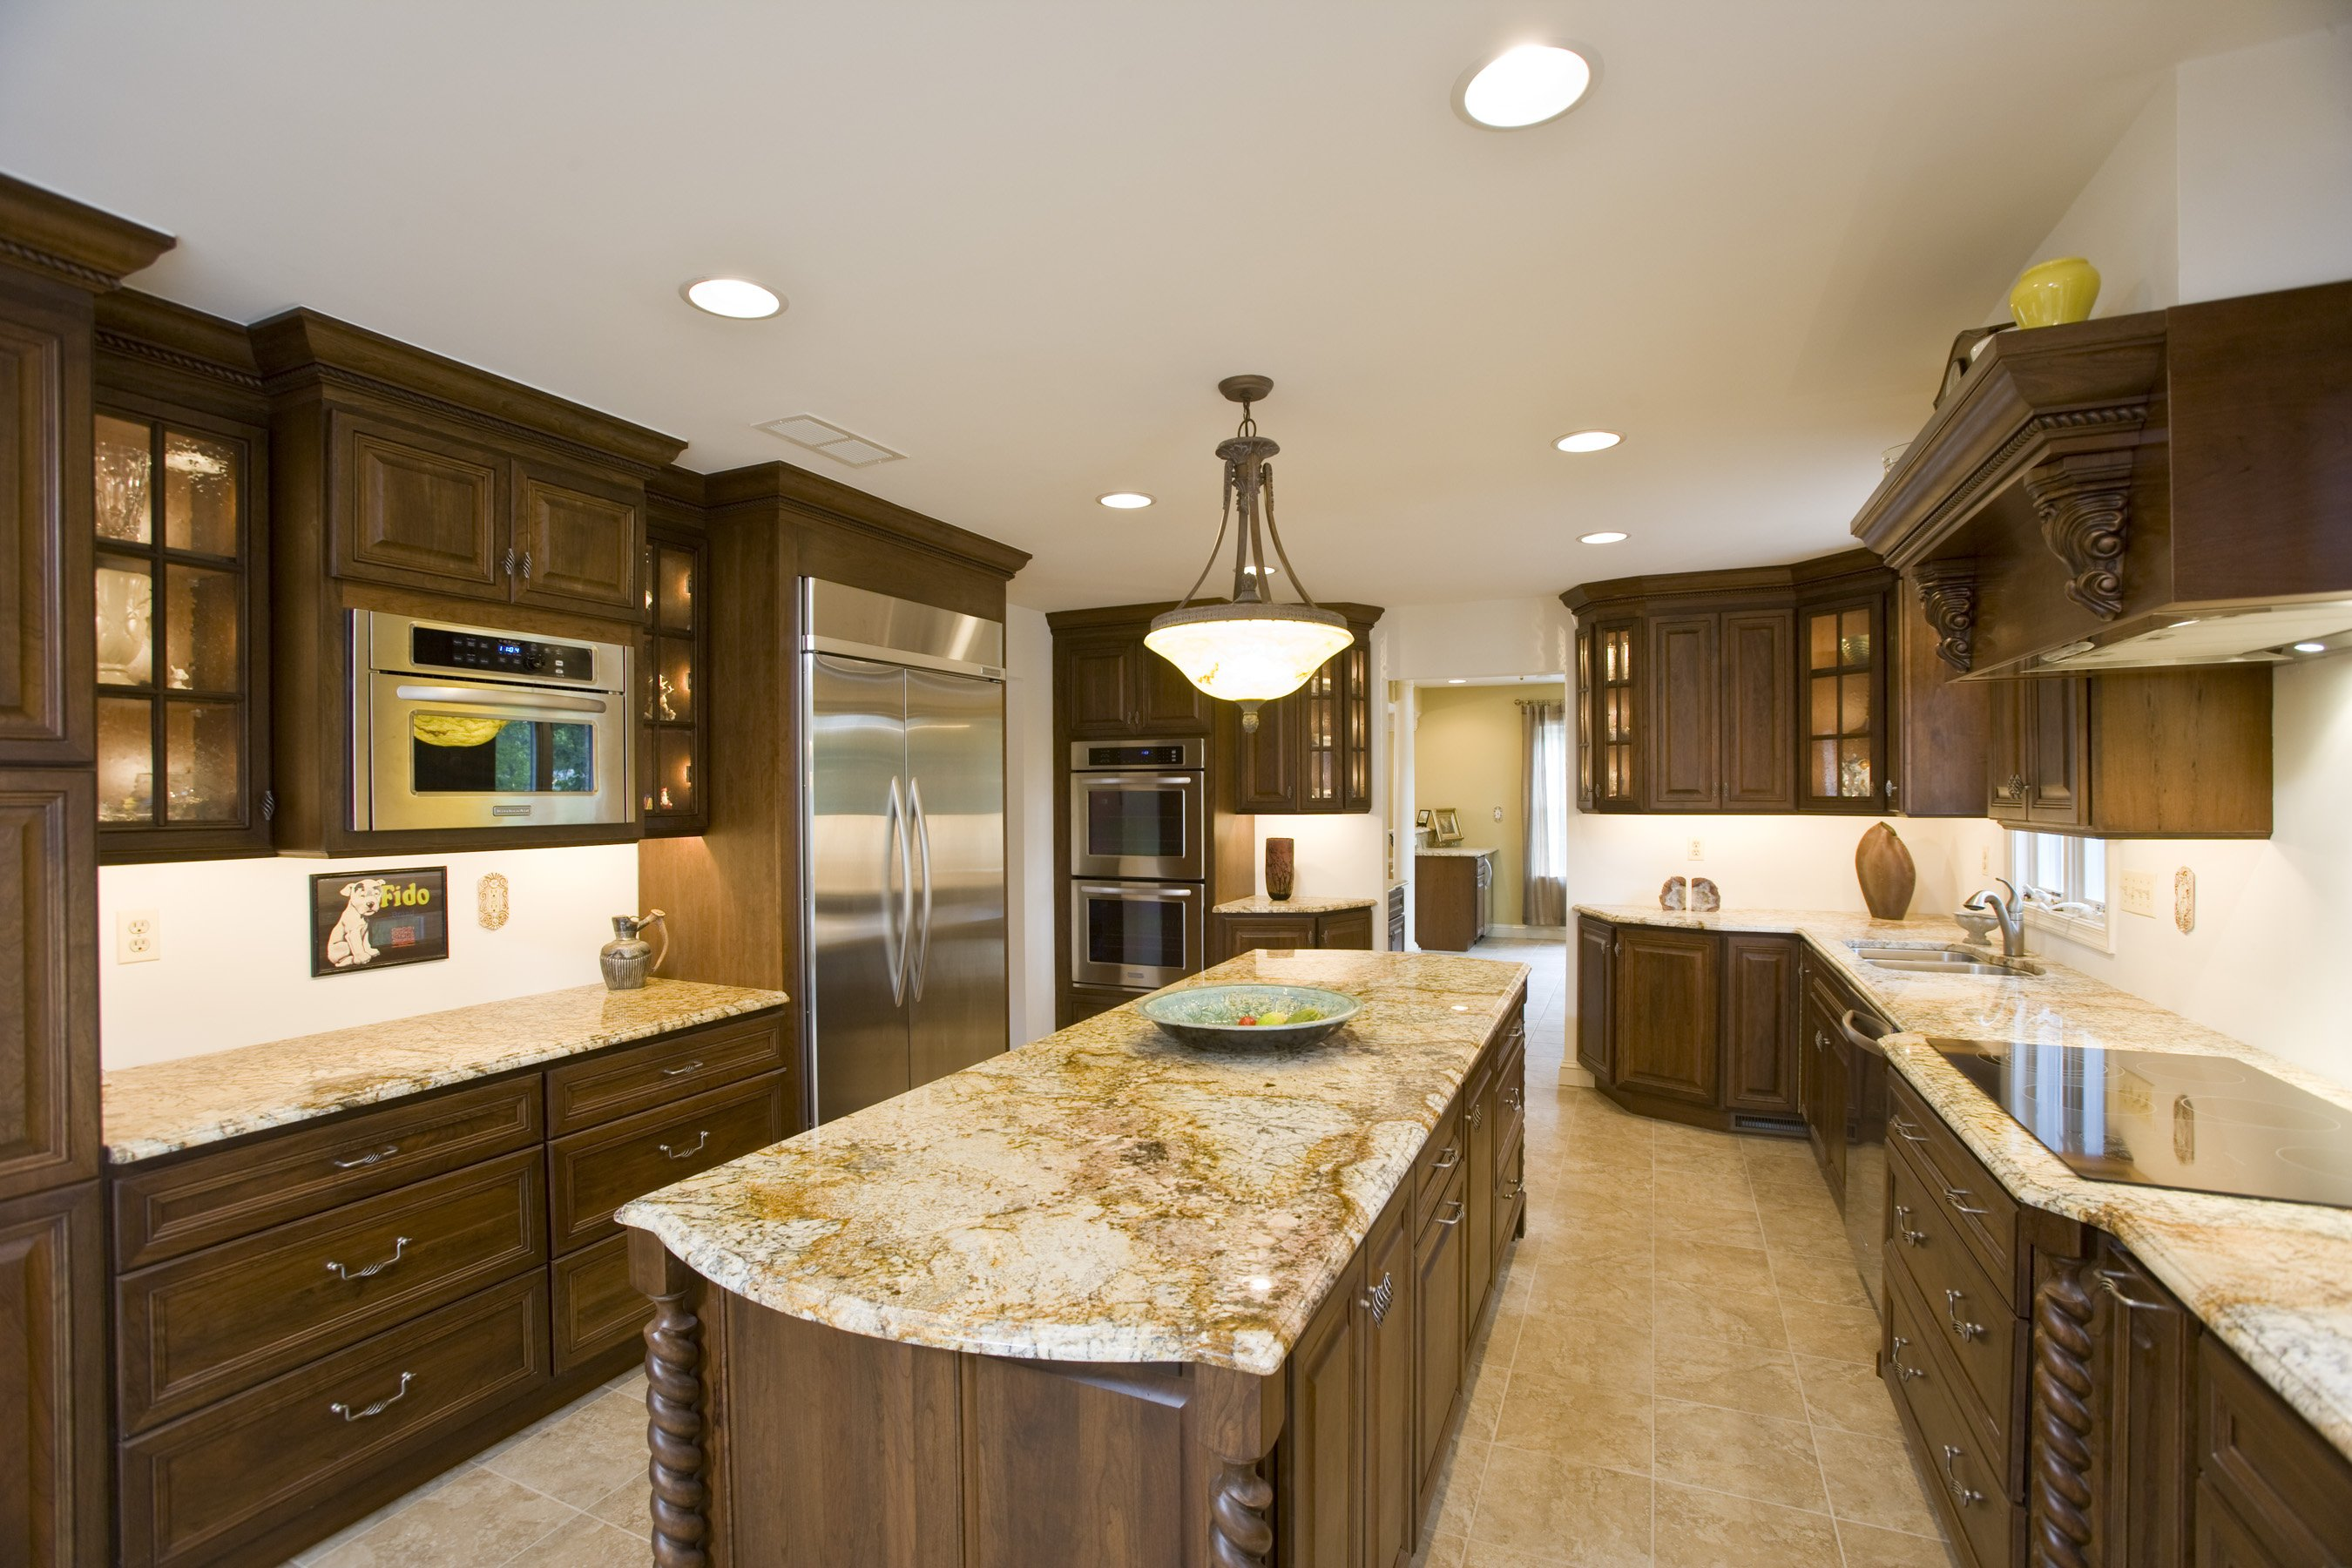 Beautiful-Granite-Kitchen-Countertops-Ideas.jpg